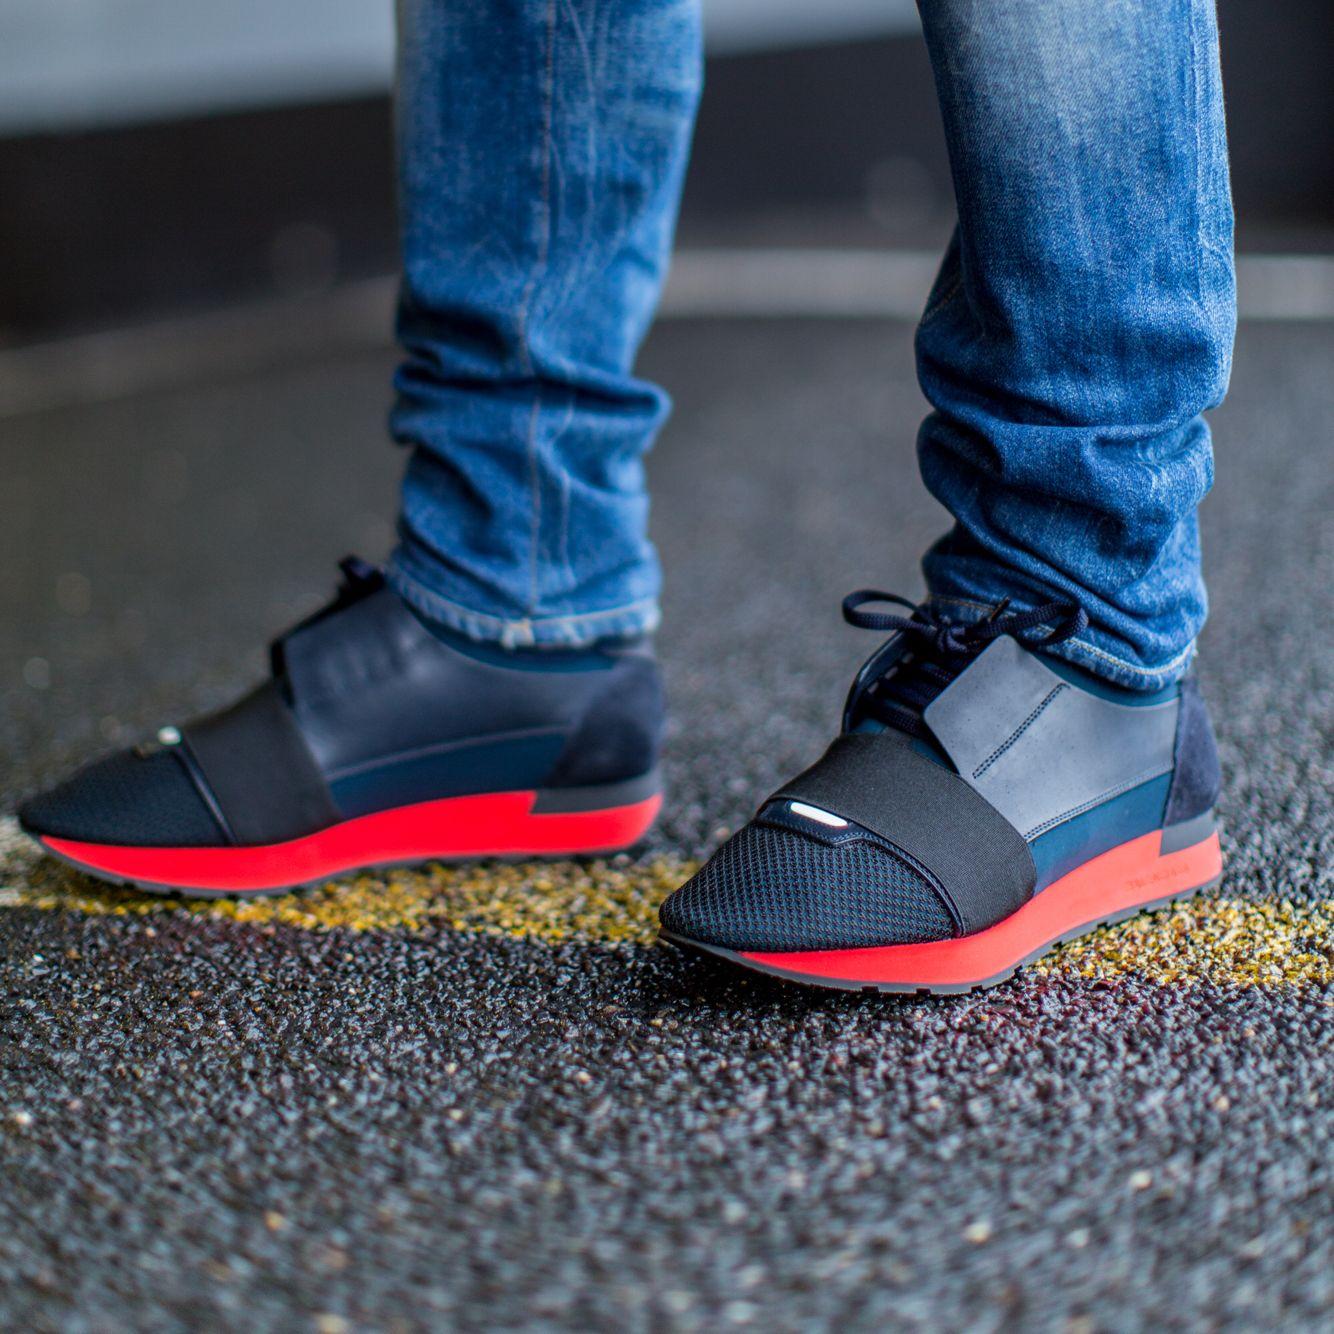 De Rode Loper Schoenen | Dress shoes